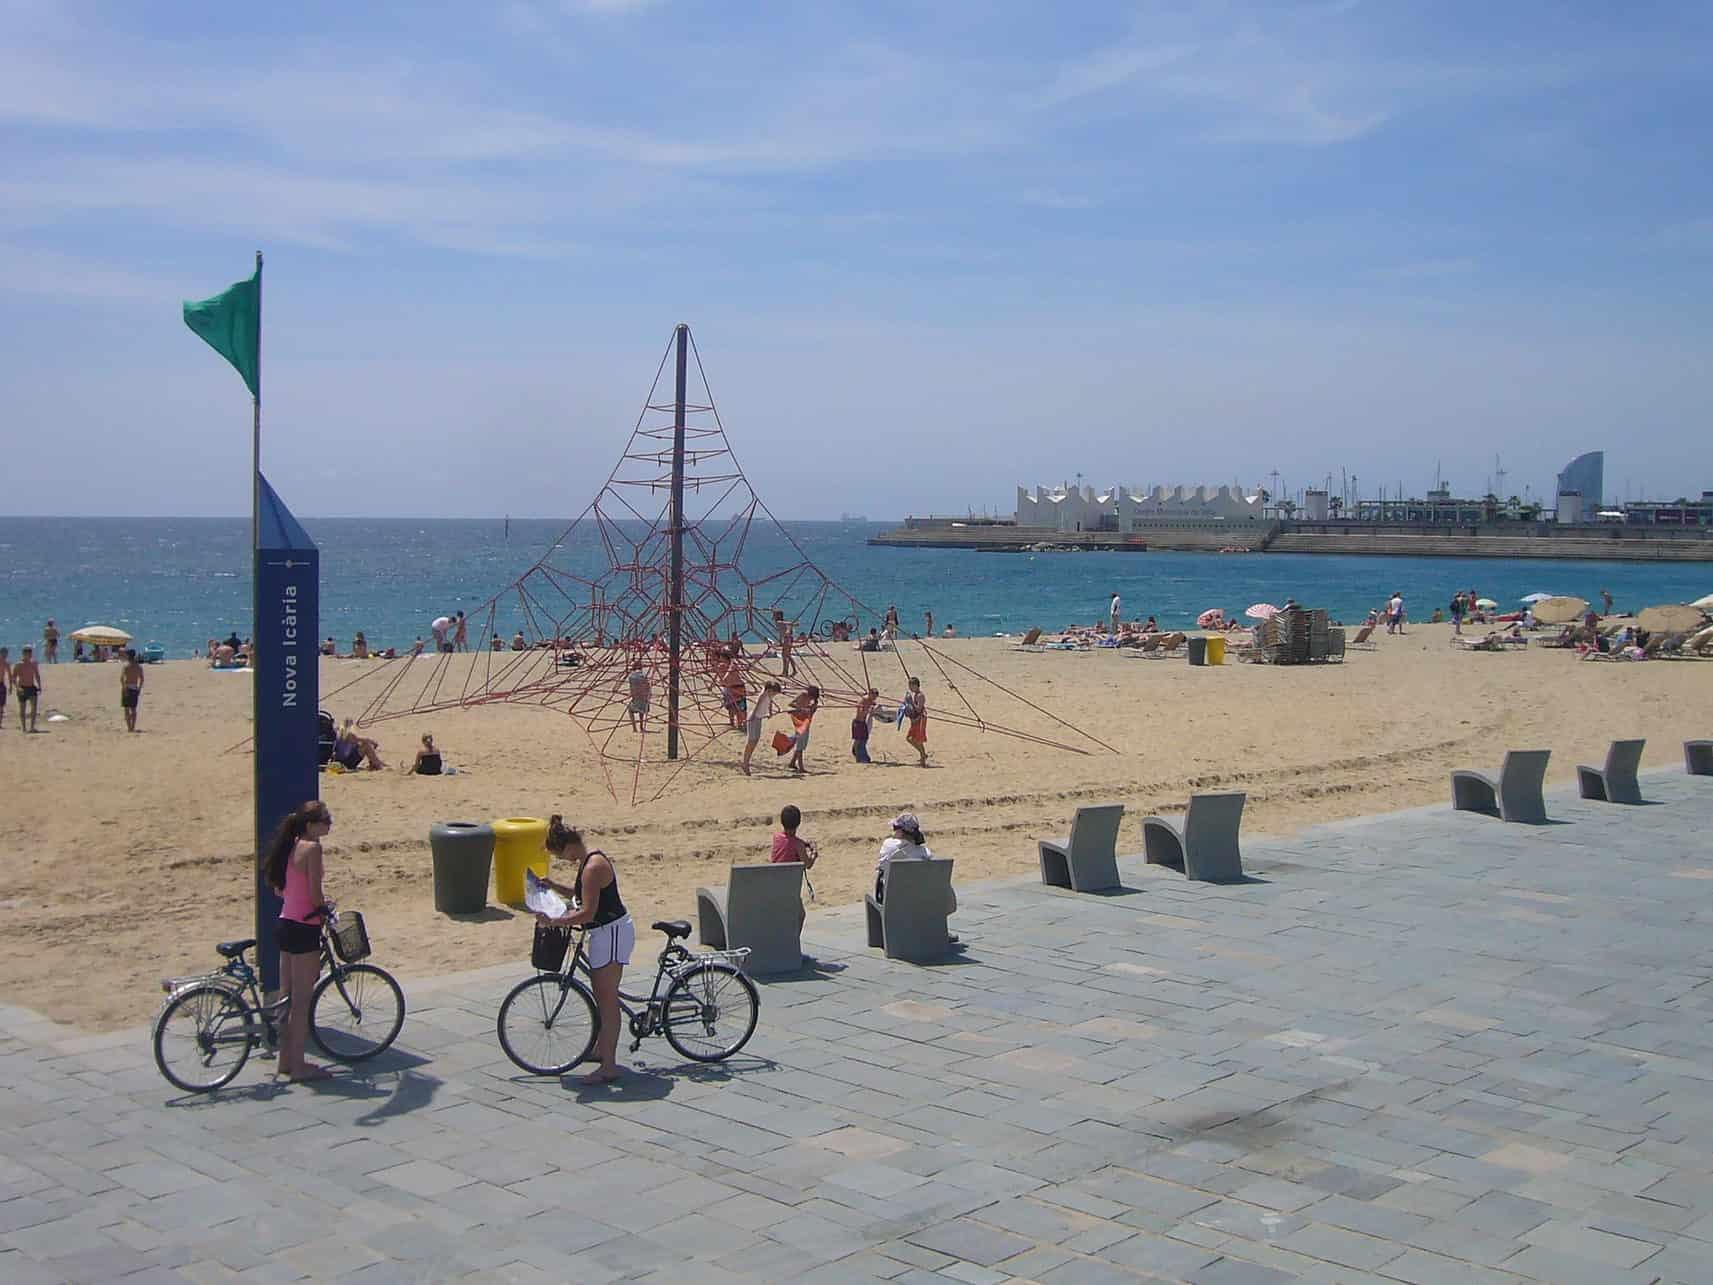 Nova Icària Beach in Barcelona, Spain